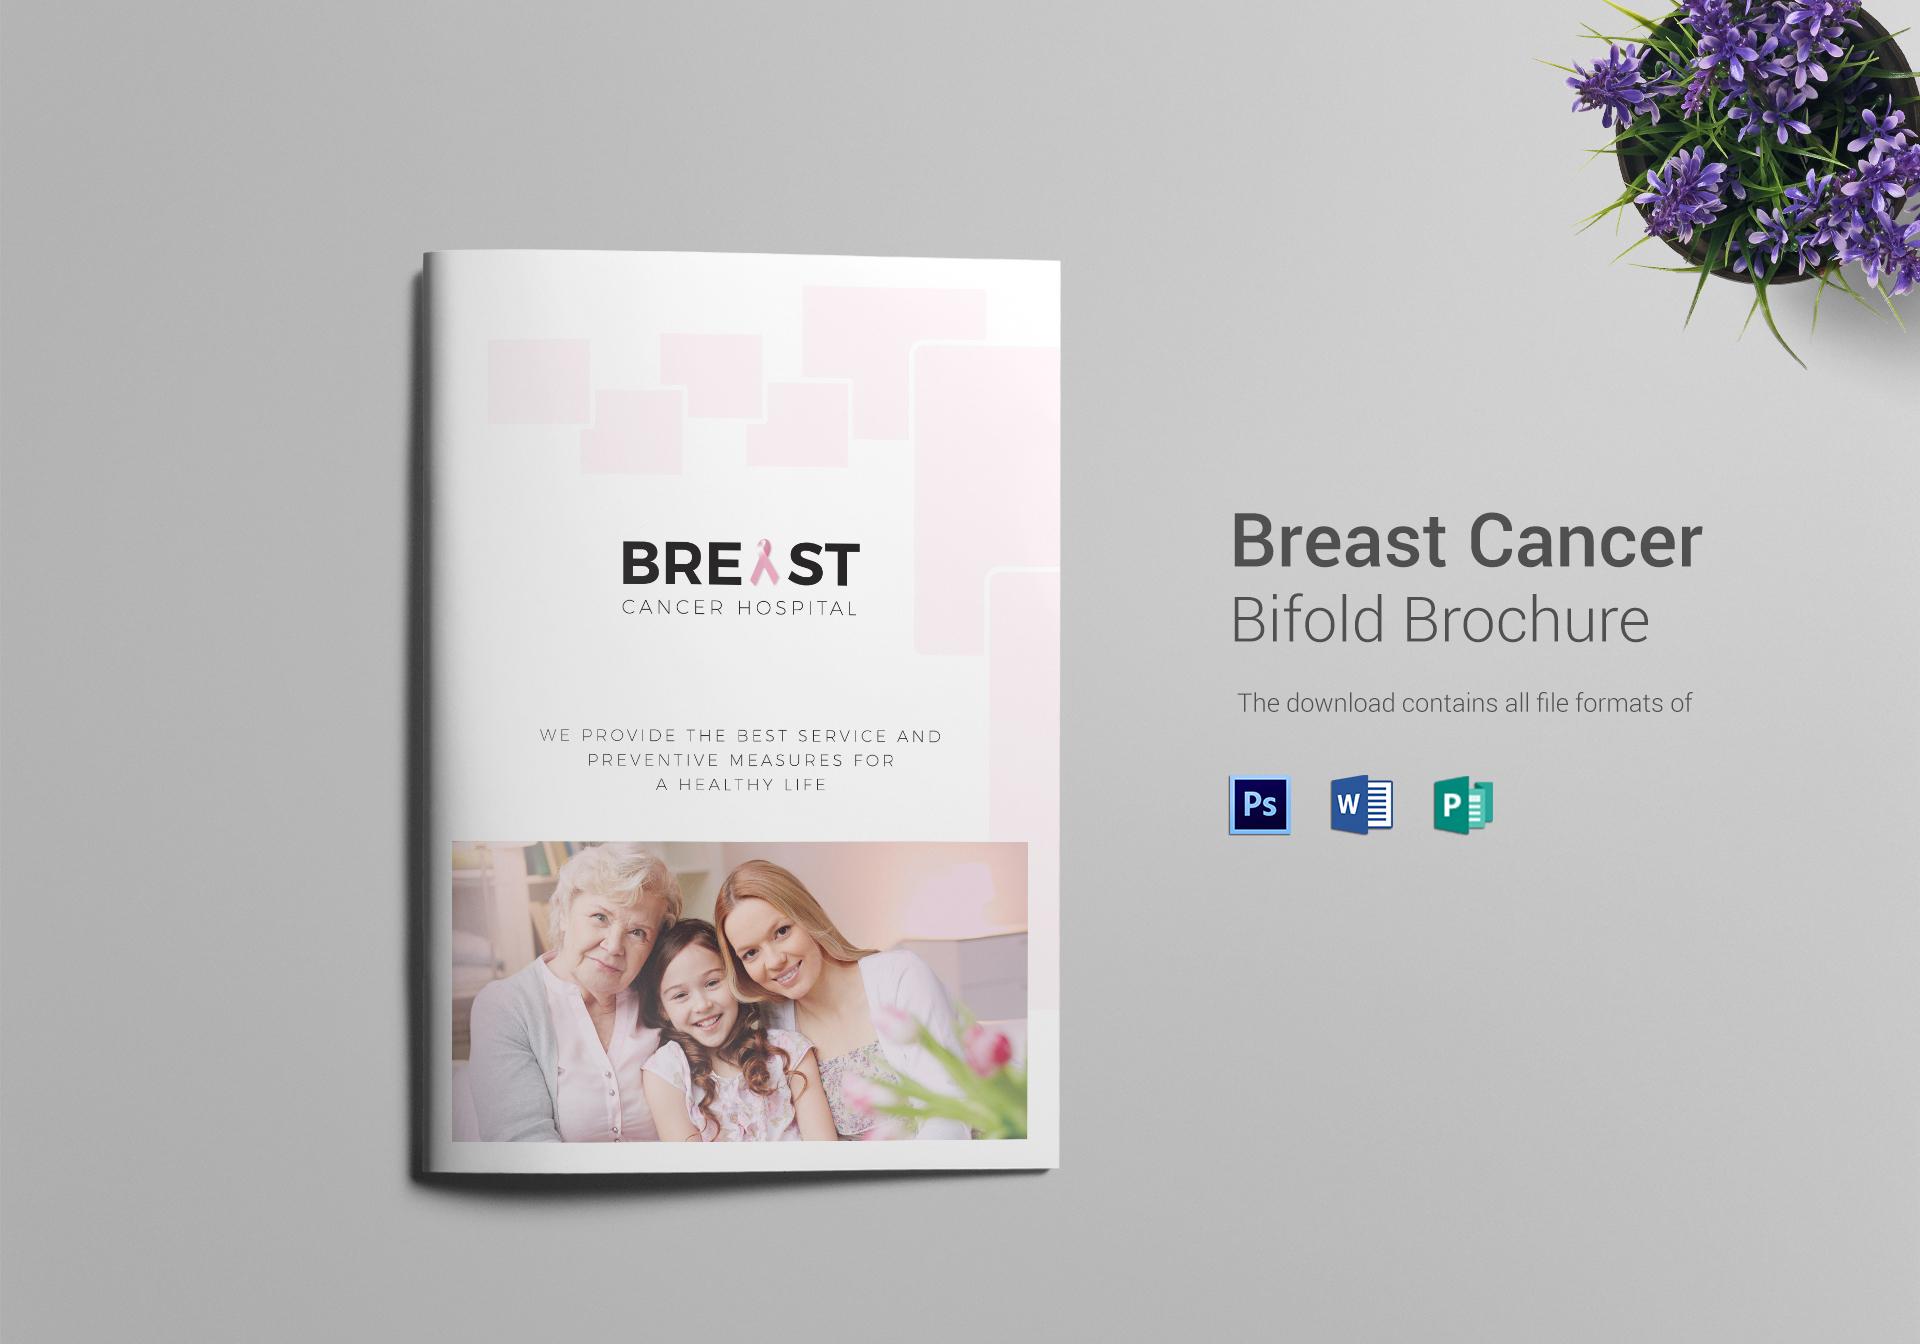 Tags:printable Bifold Brochure Templates 79 Free Word Psd,free Bi Fold  Brochure Templates Sample Bi Fold Brochure,65 Print Ready Brochure  Templates Free Psd